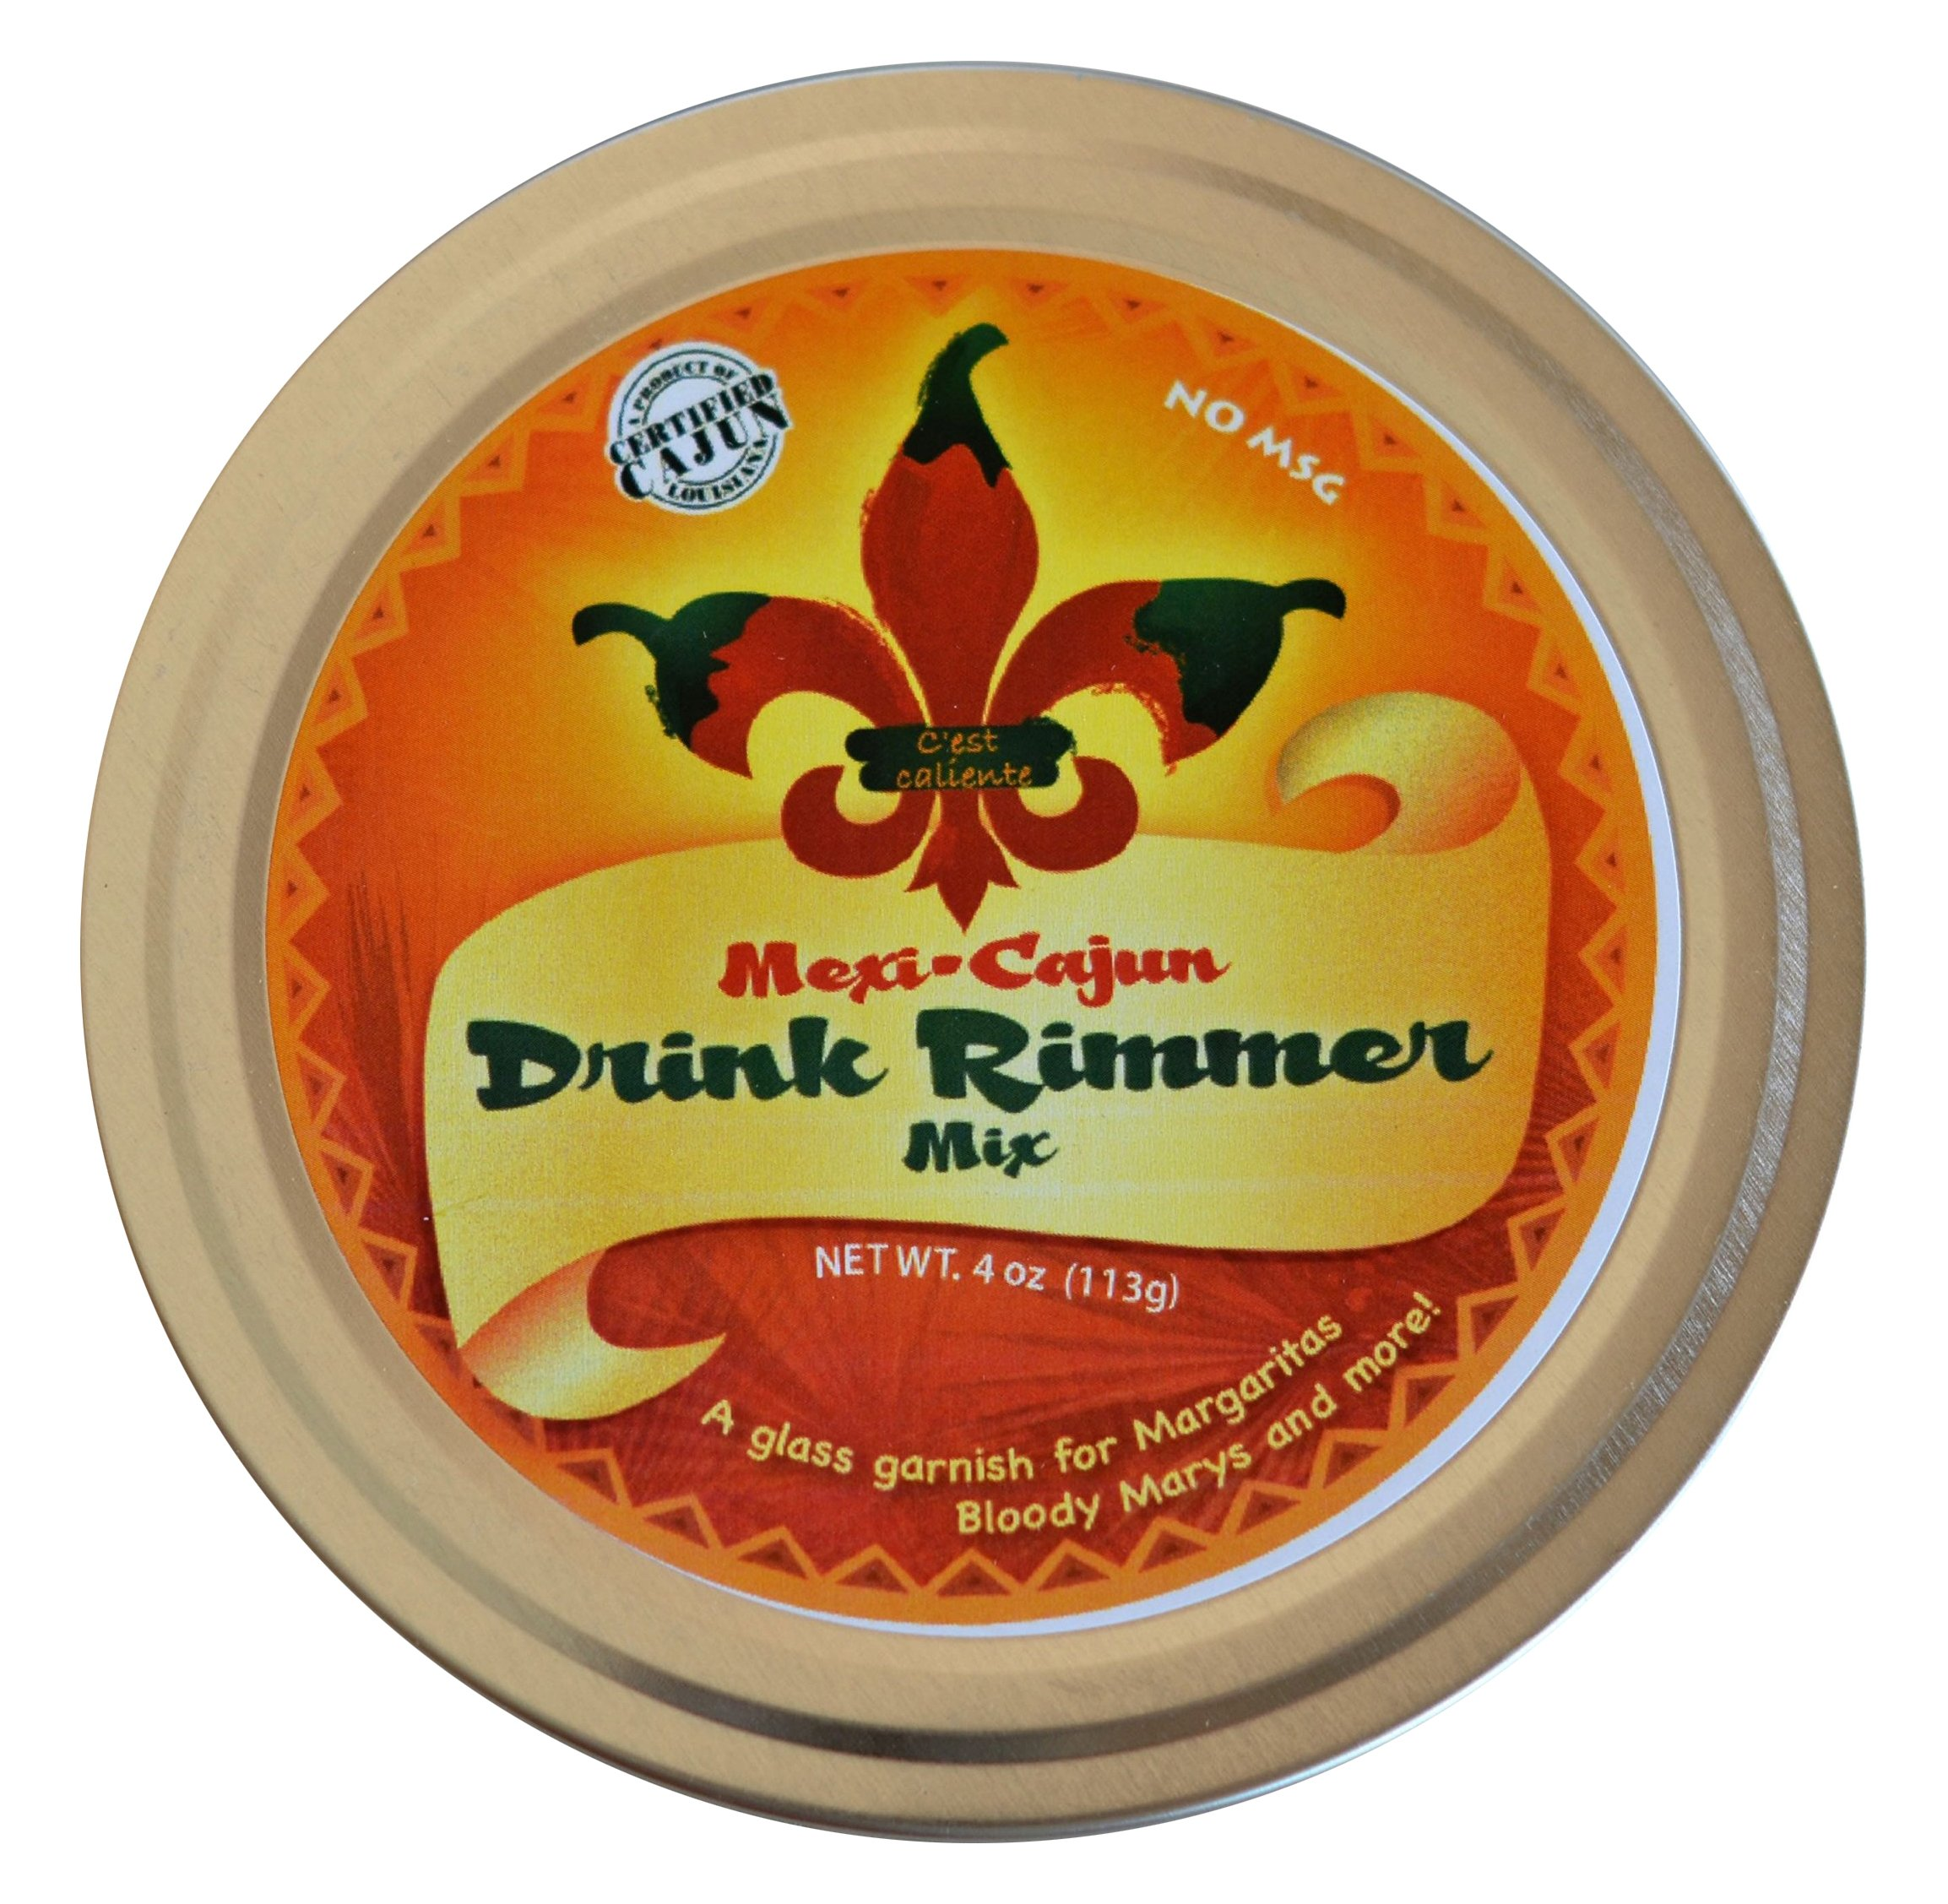 Mexi-Cajun Drink Rimmer